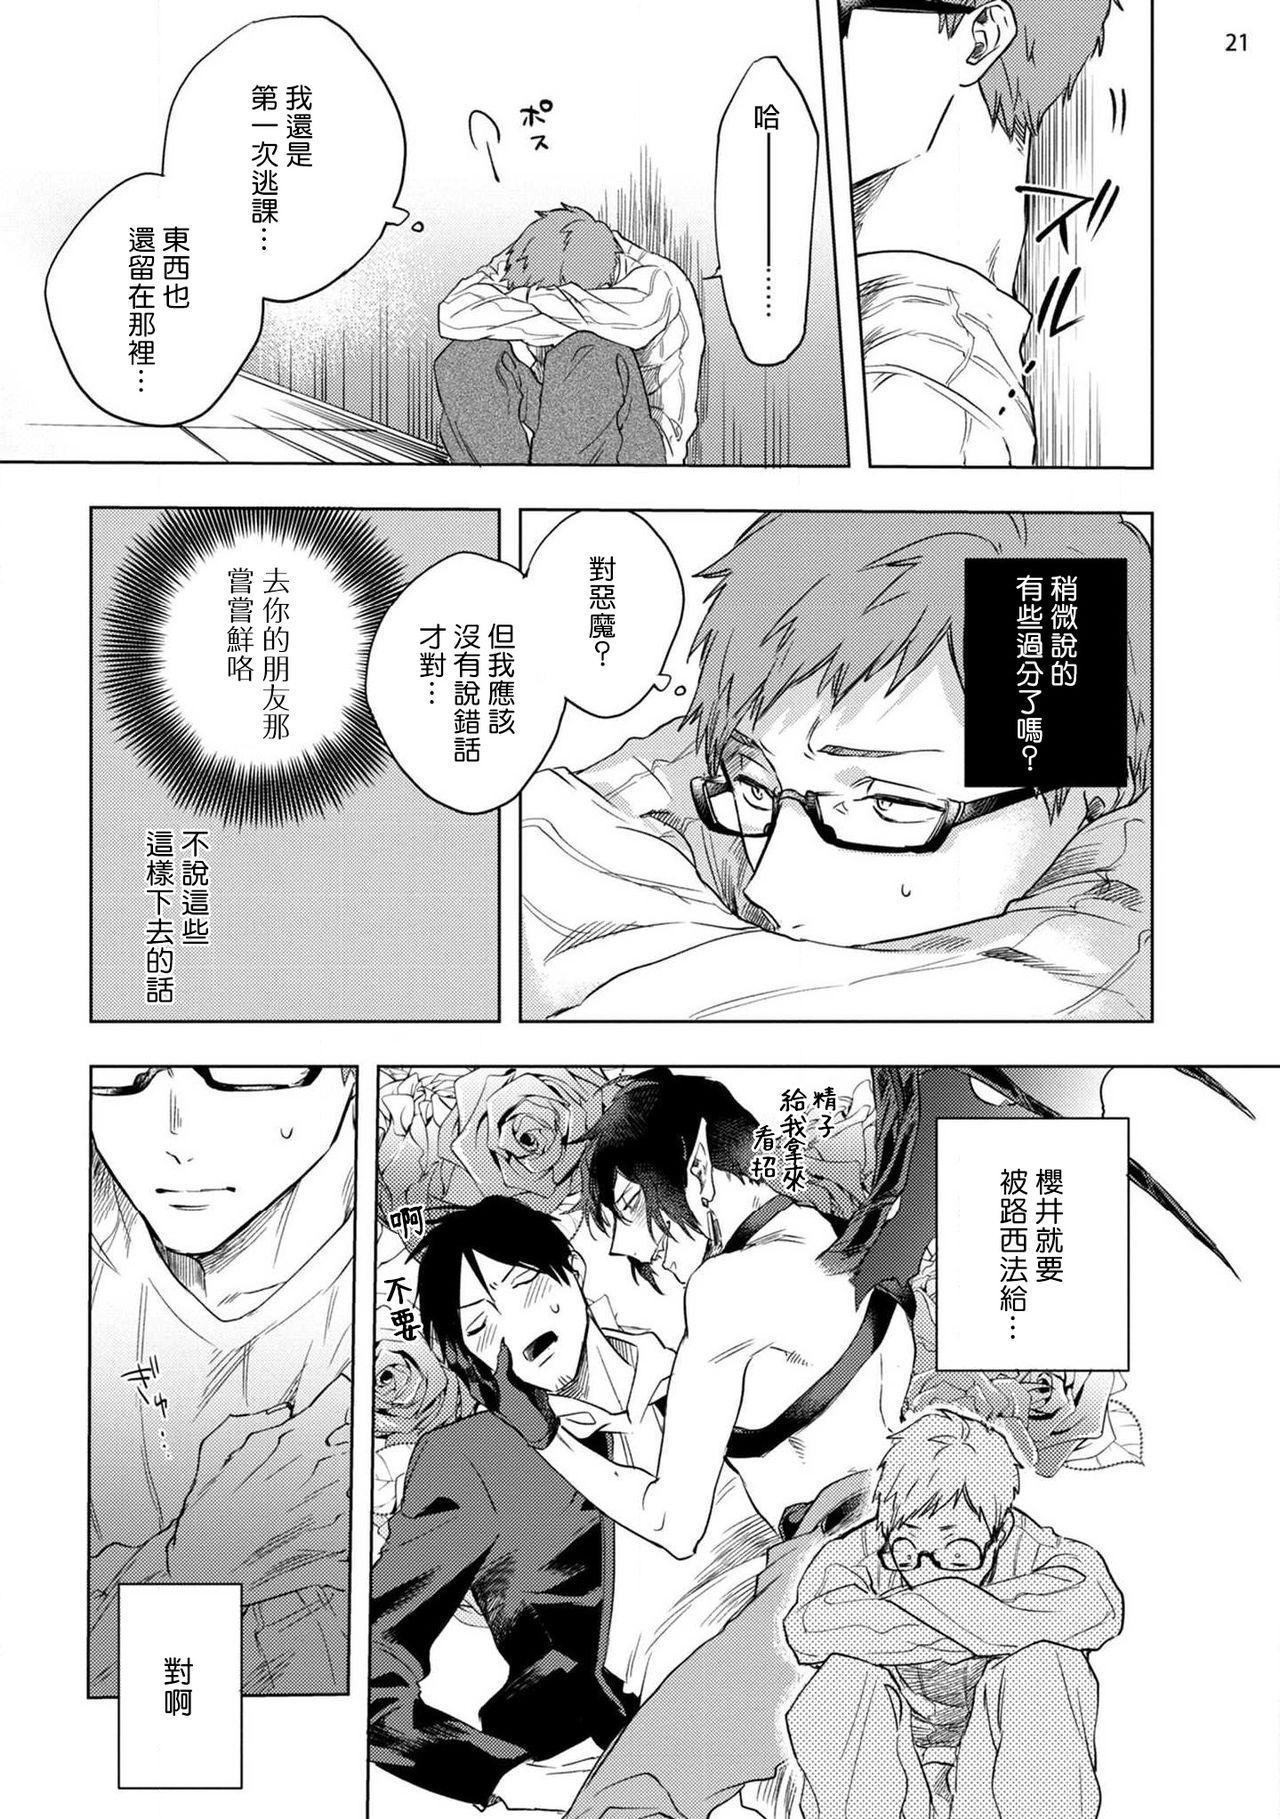 [Yao] Inma-sama ni Hallelujah!   赞美淫魔大人! Ch. 1-3 [Chinese] [拾荒者汉化组] [Digital] 57